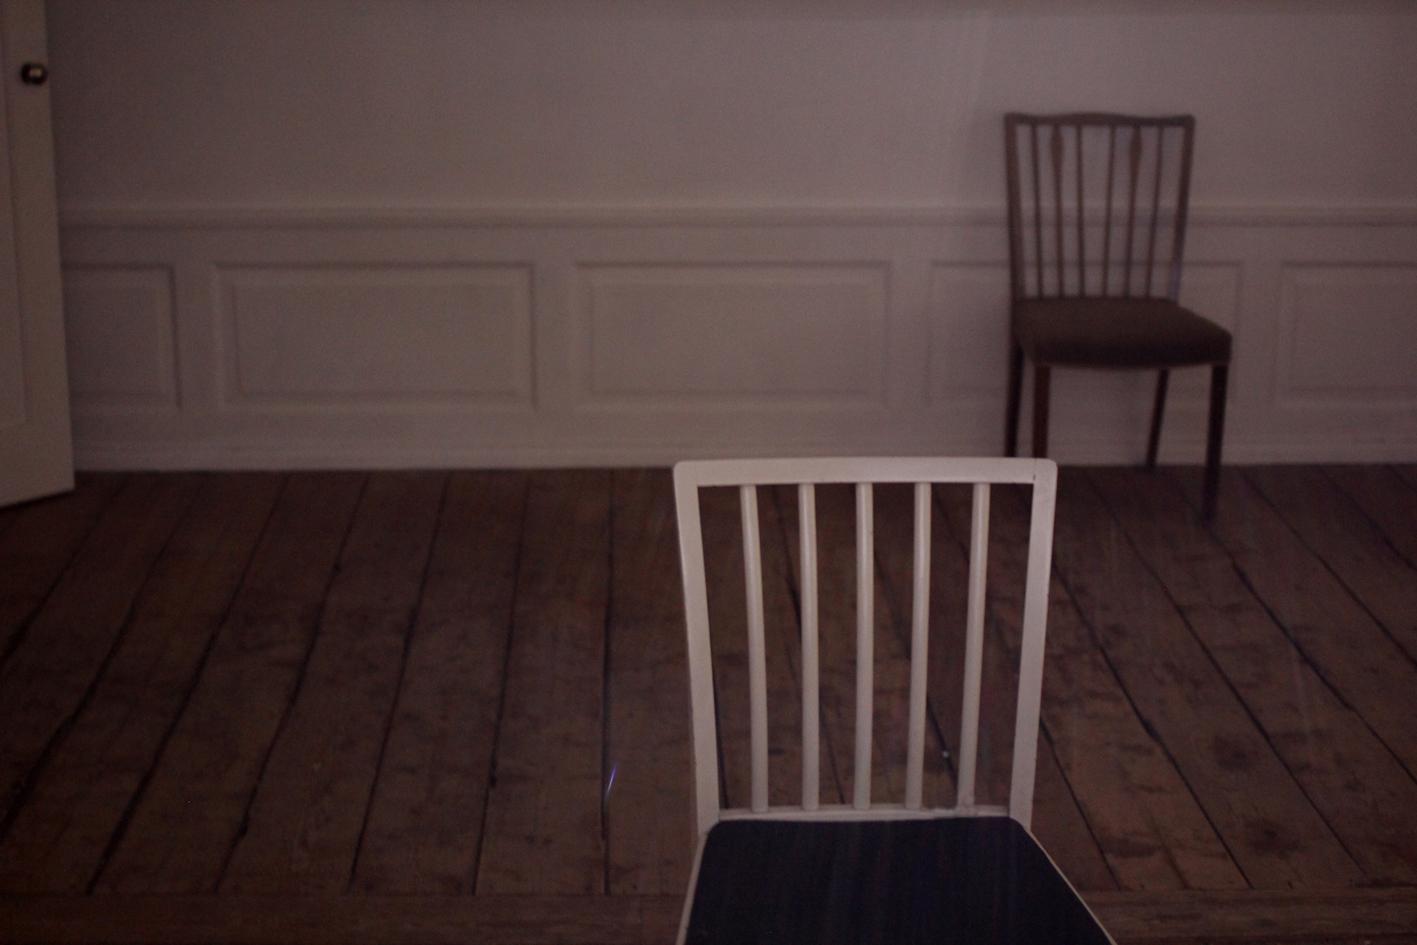 chairsinroom.jpg